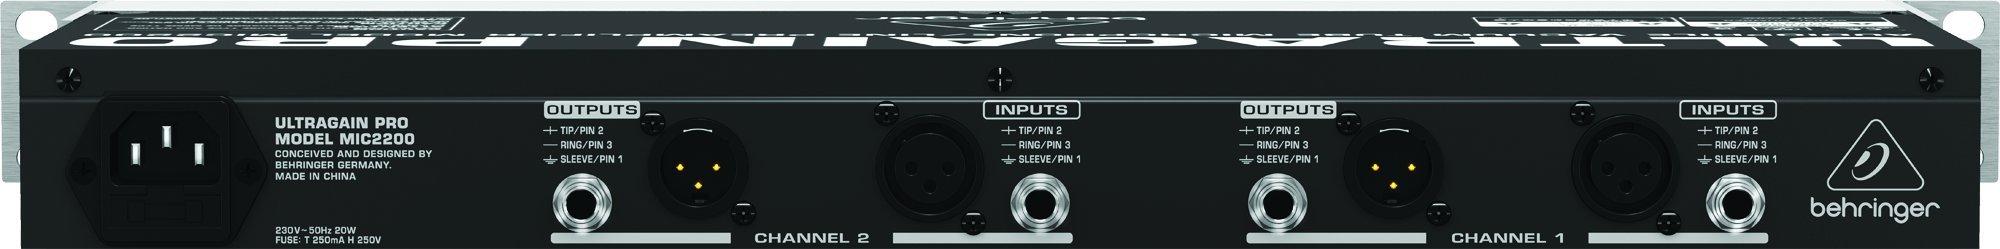 Behringer Ultragain Pro MIC2200 Audiophile Vacuum Tube Microphone/Line Preamplifier